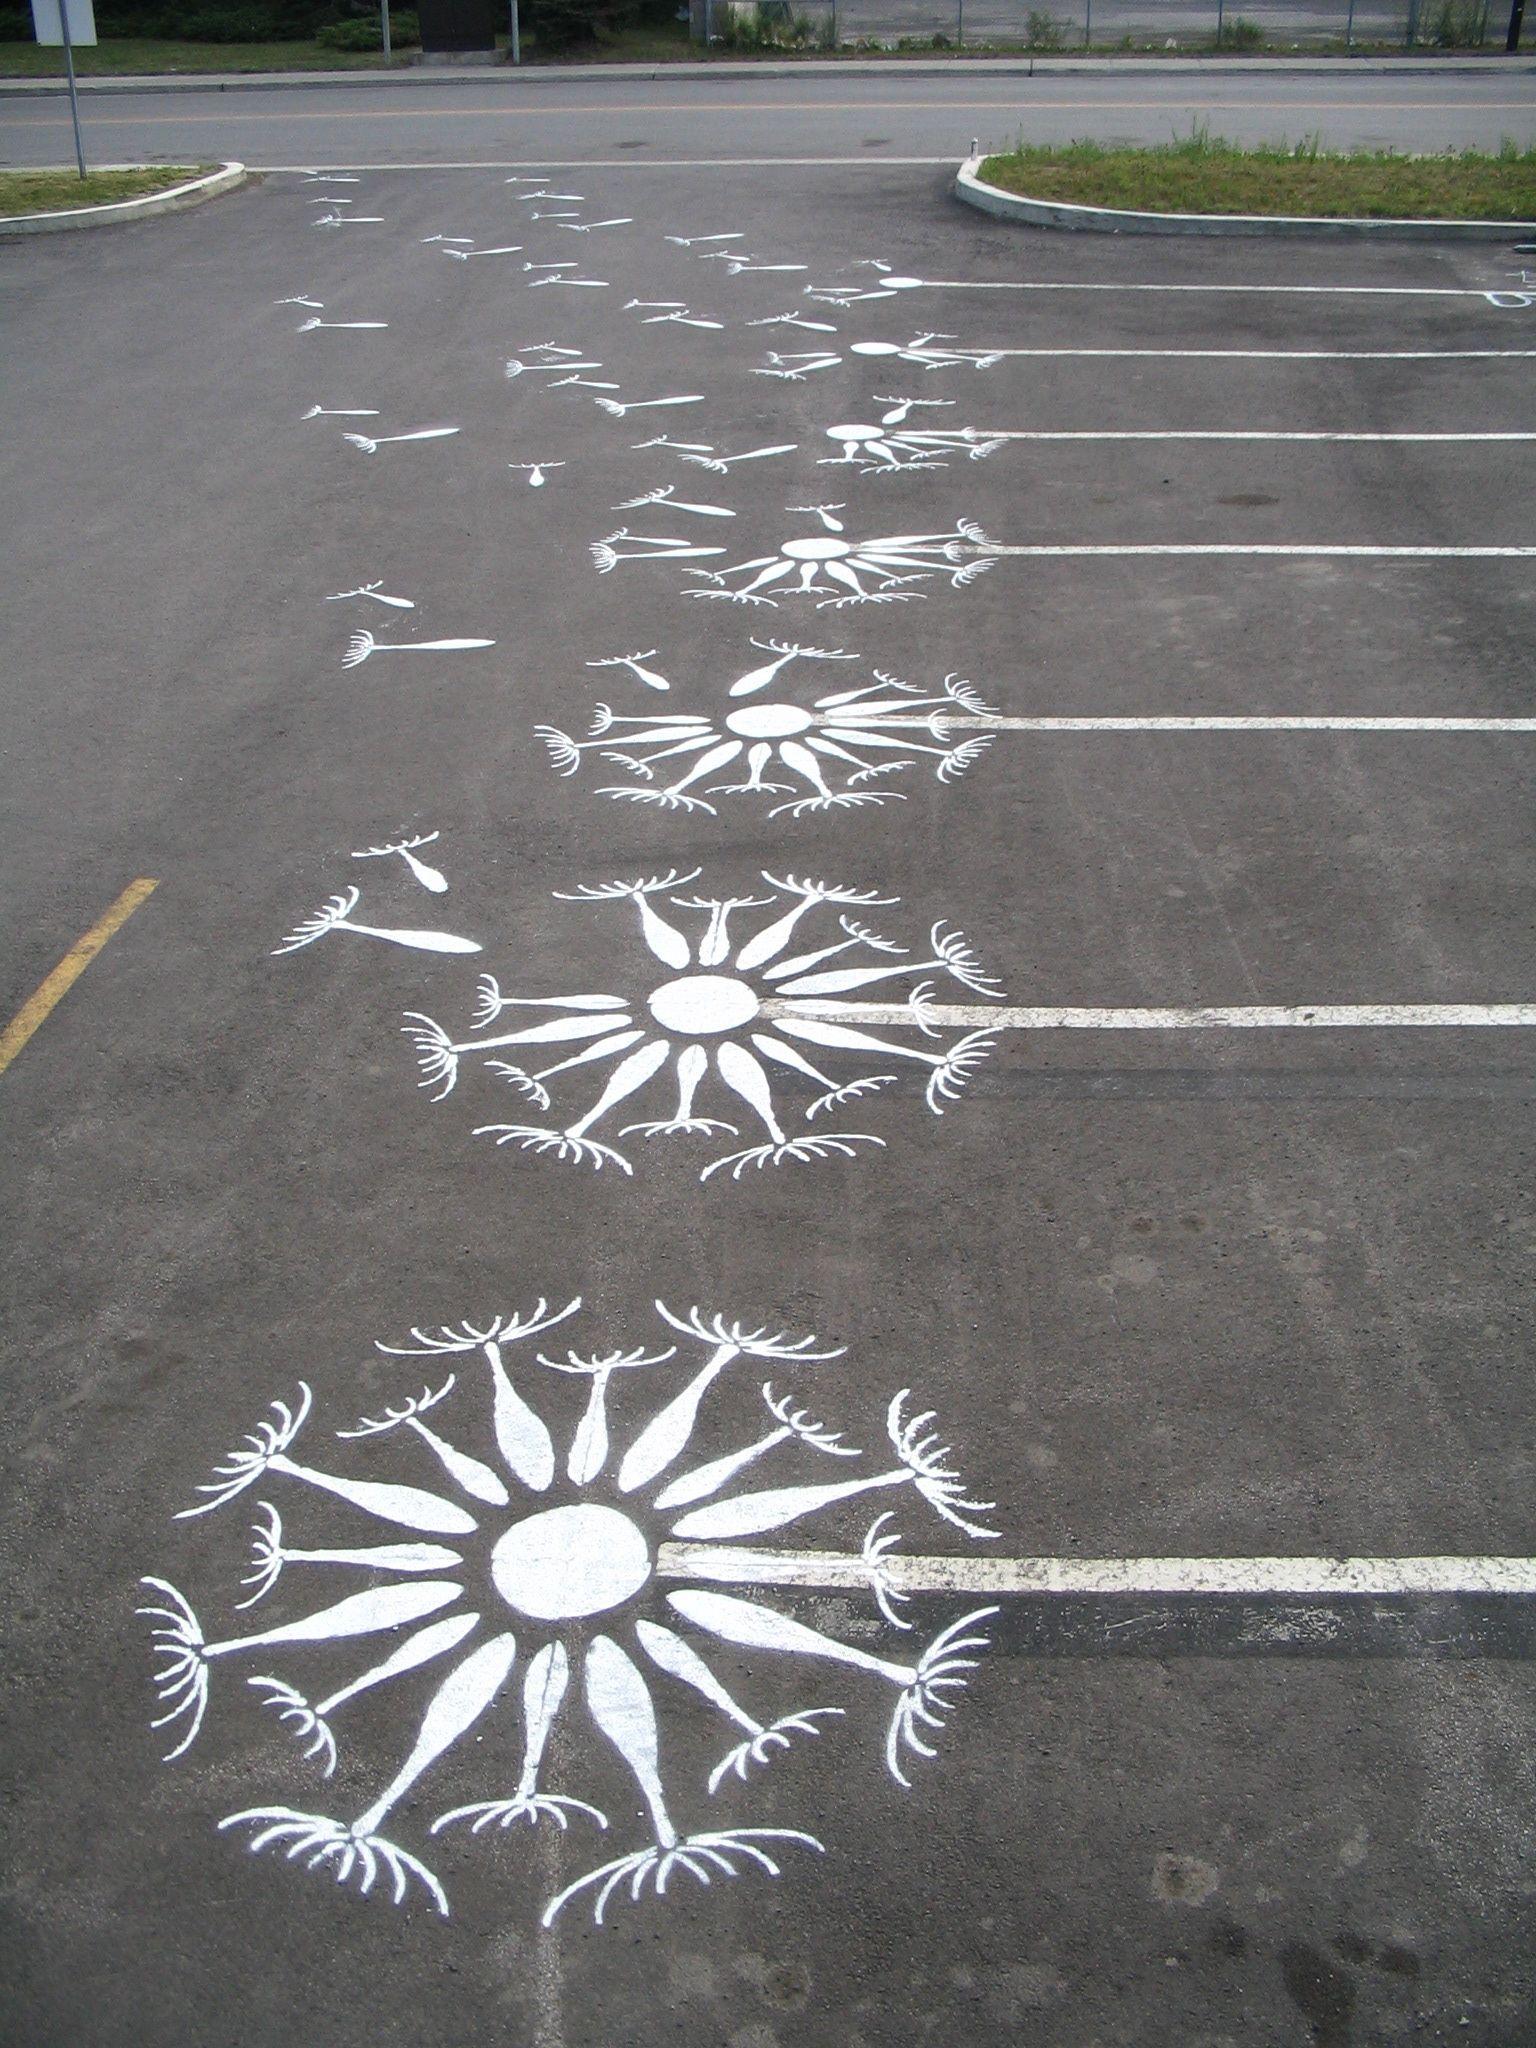 Graffiti art diy - Diy Go Graffiti A Parking Lot Wind Blowing Dandelion Seeds Into The Air